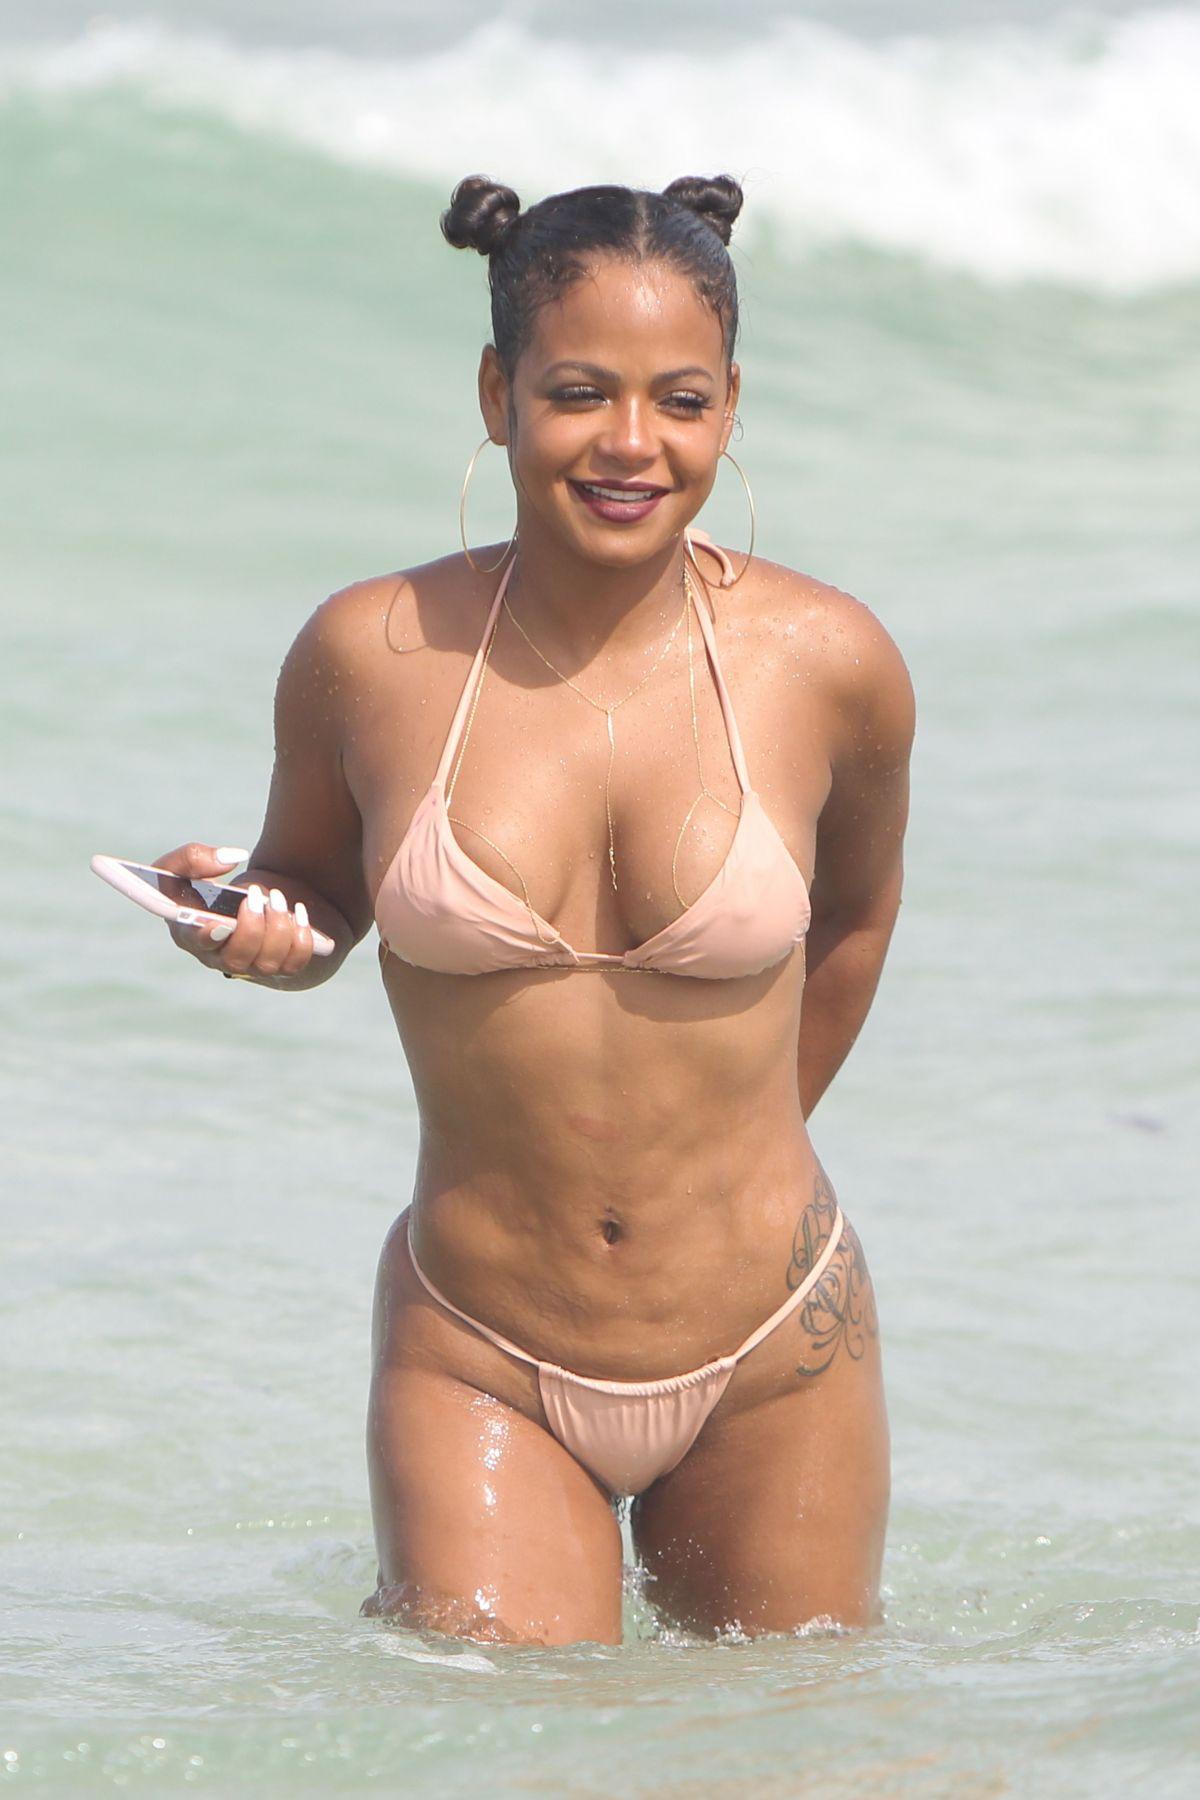 image Christina milian sexy beach bikini selfie vid